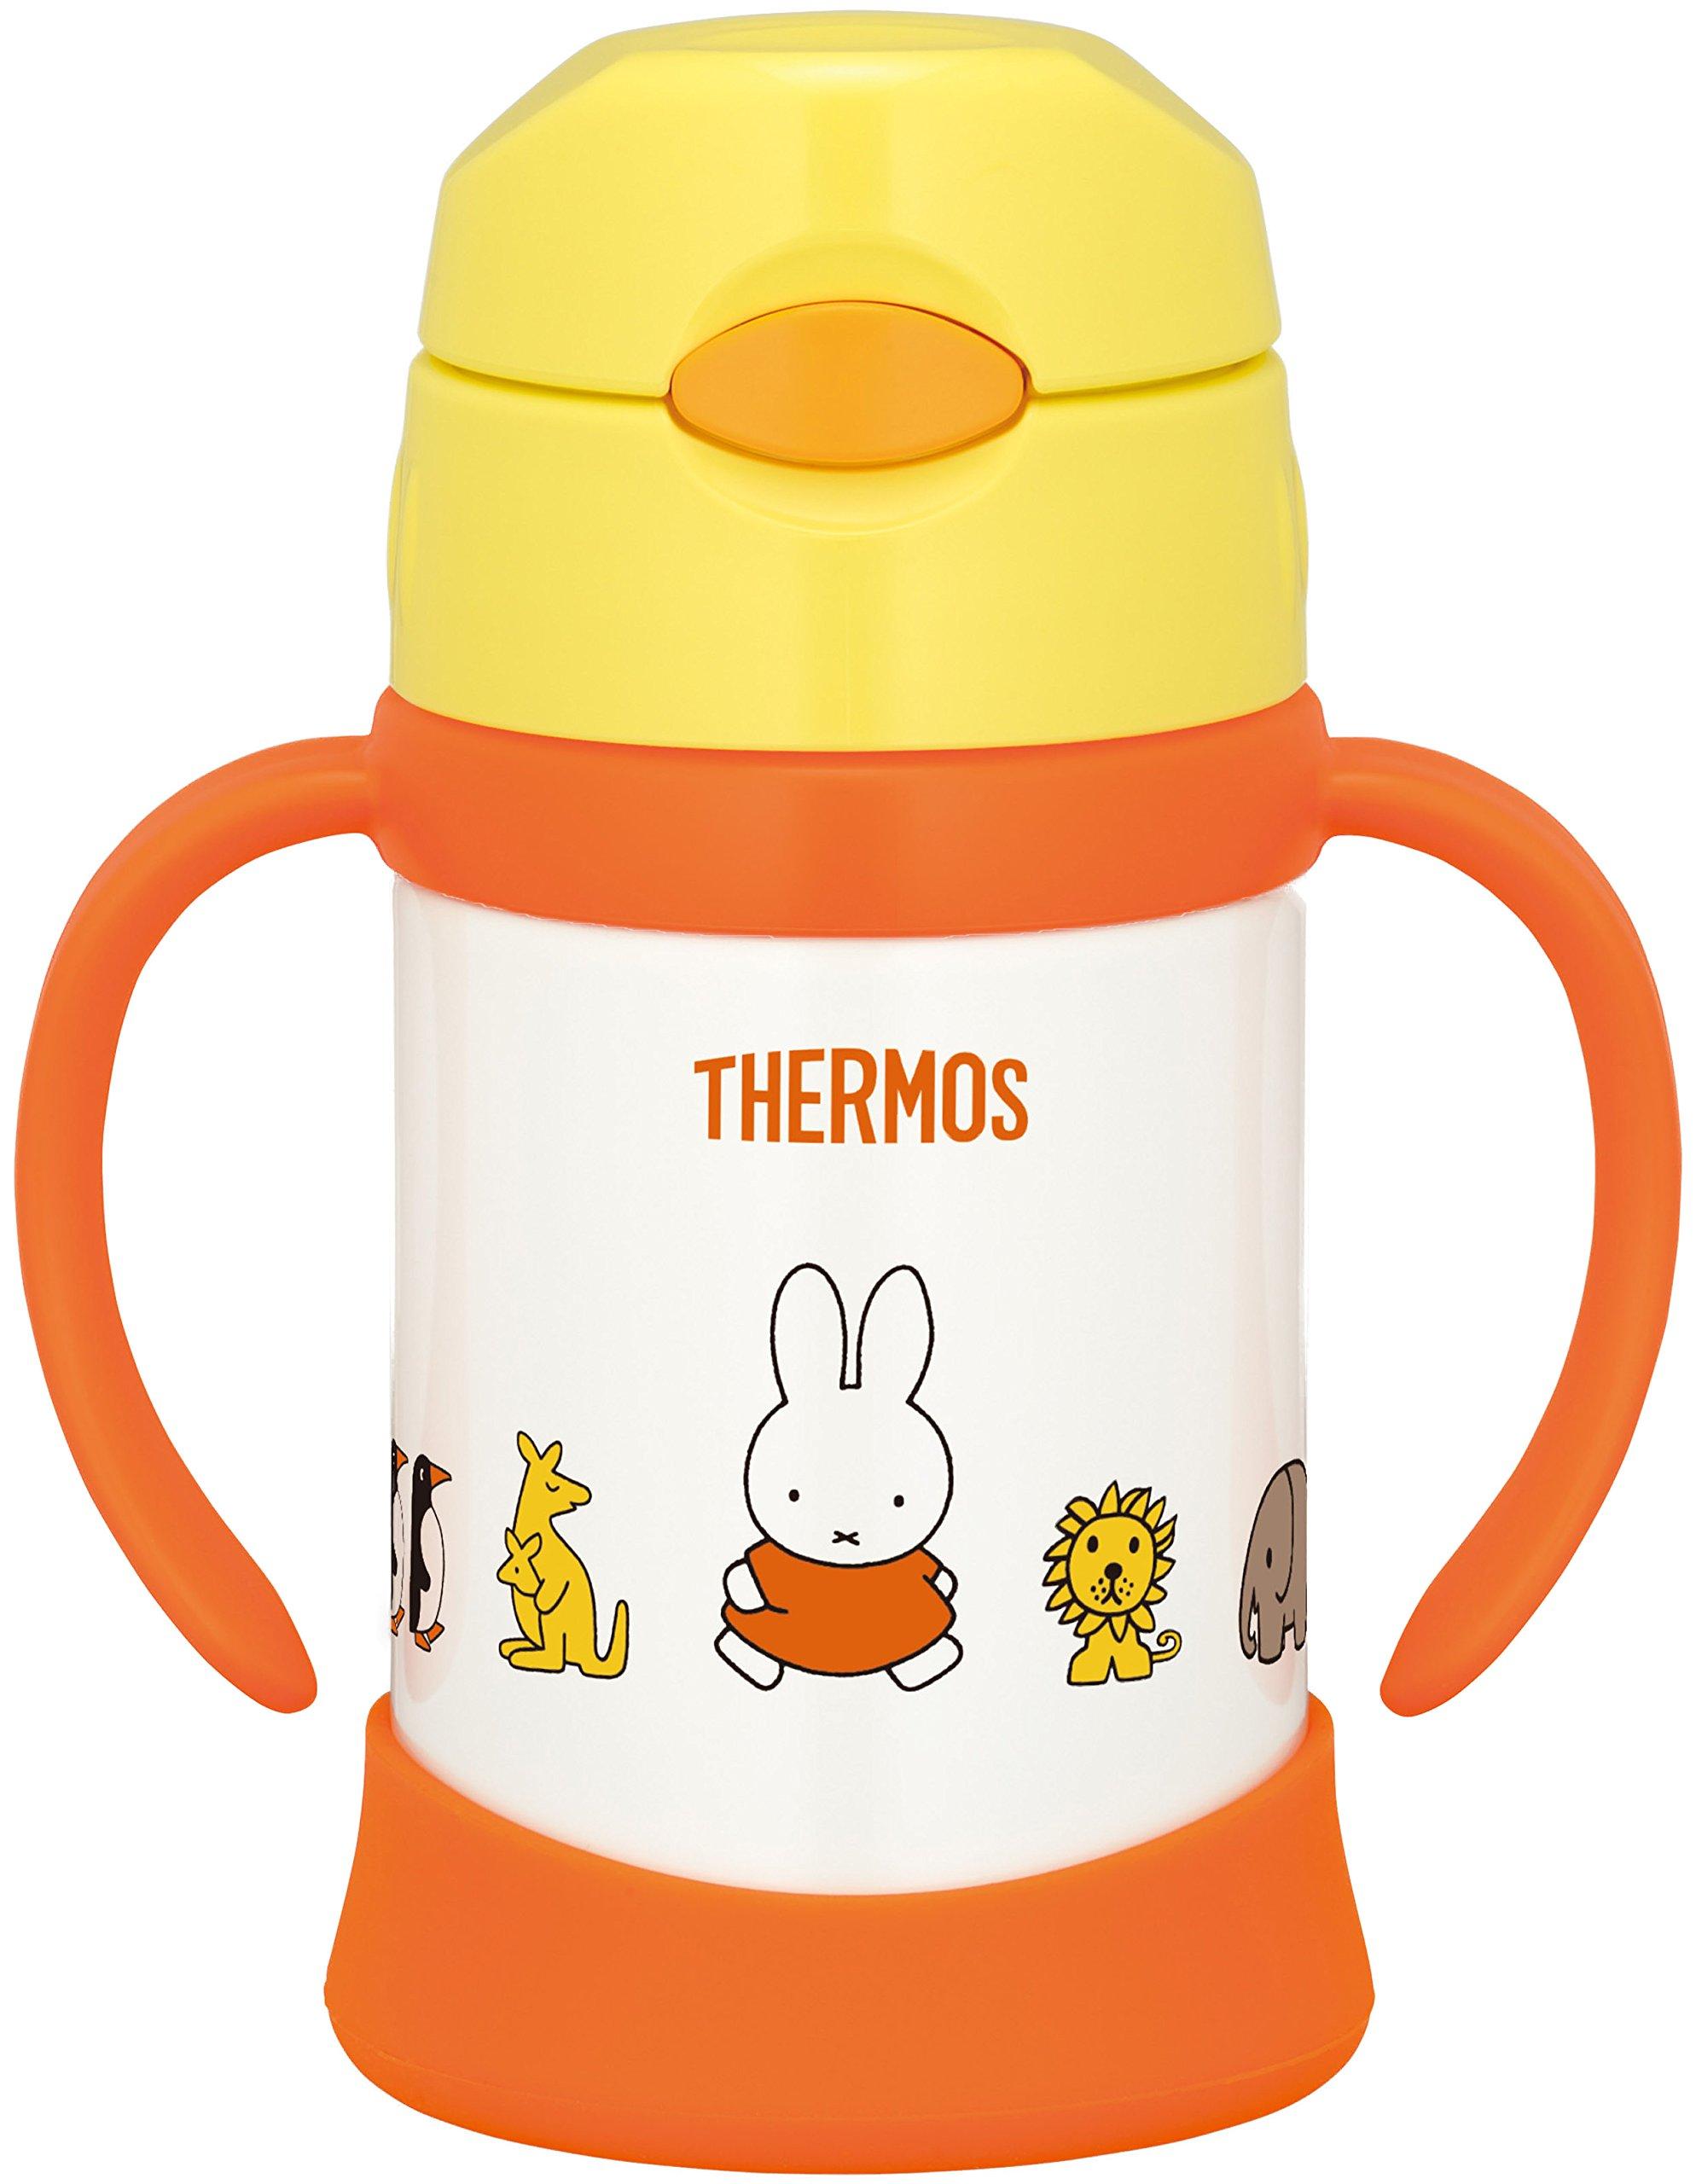 THERMOS 真空保温 宝宝用吸管杯  黄色 9个月及以上 250ml FHI-250B